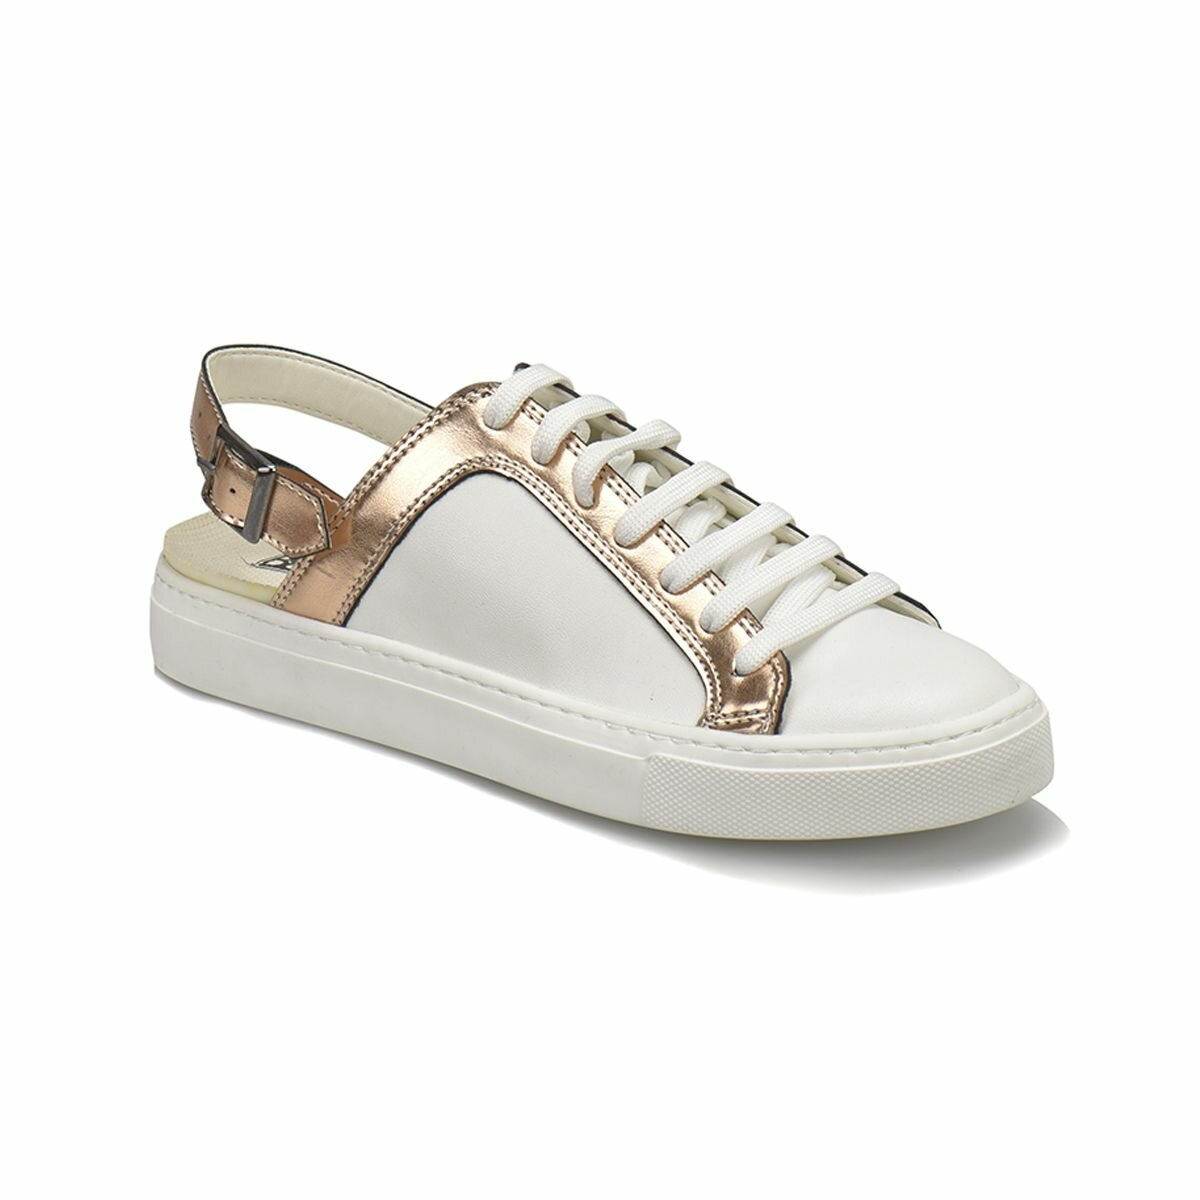 FLO CS18089 White Women 'S Shoes Art Bella